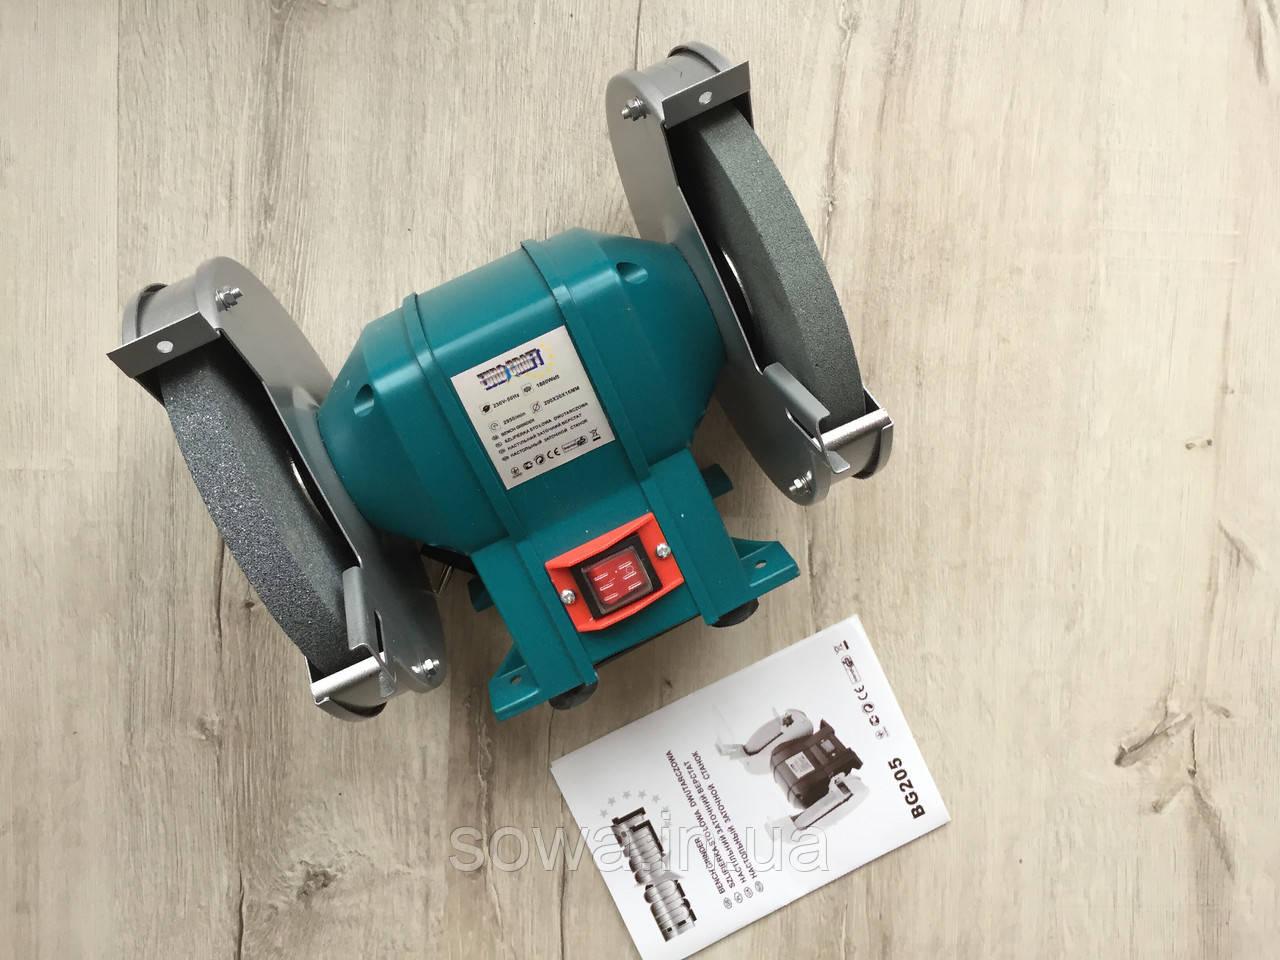 ✔️ Точило Euro Craft BG 205  |  200мм, 1800 Вт